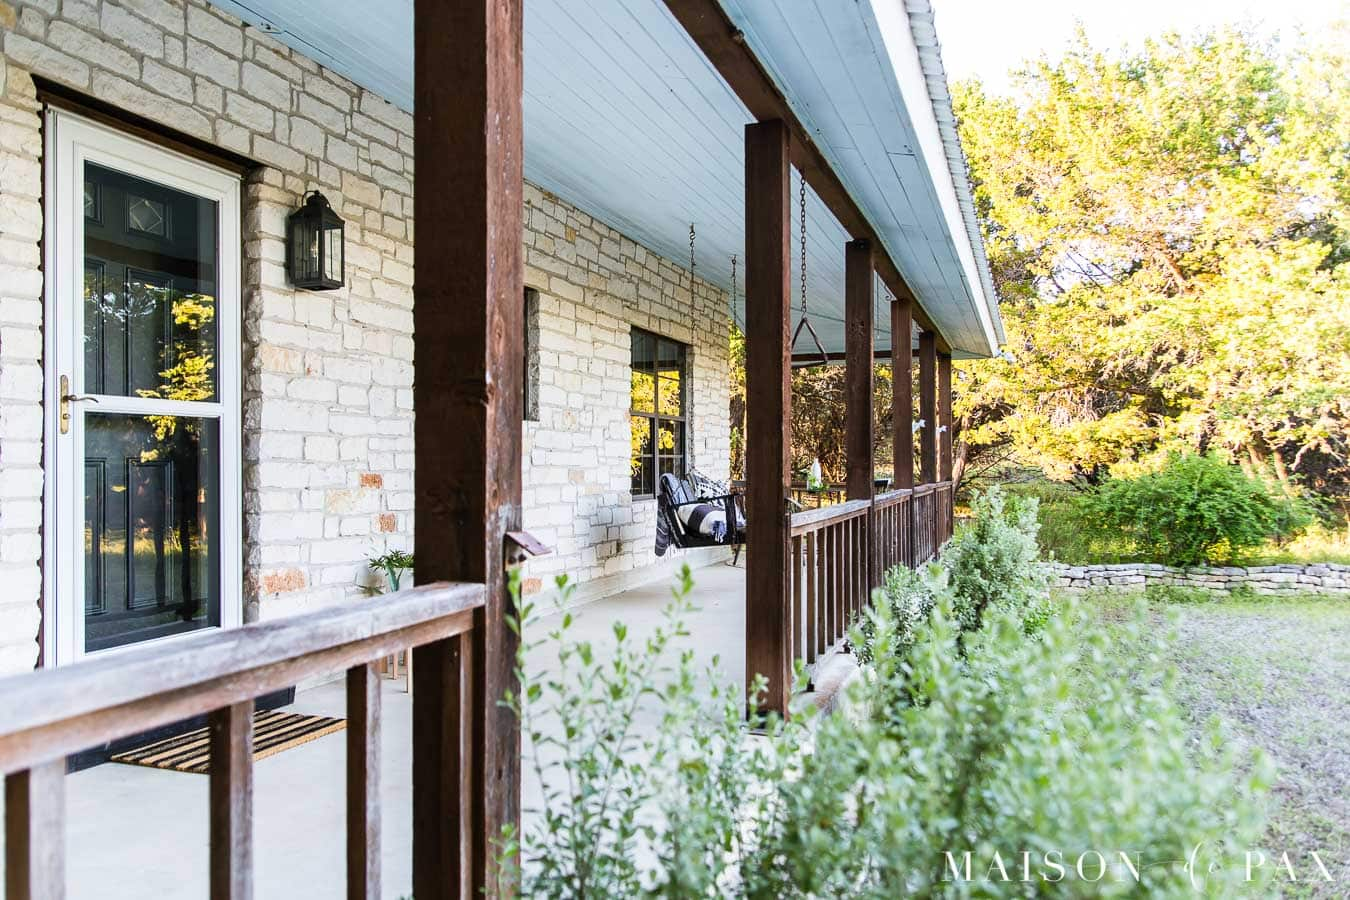 cedar posts and railings on porch with haint blue ceiling   Maison de Pax